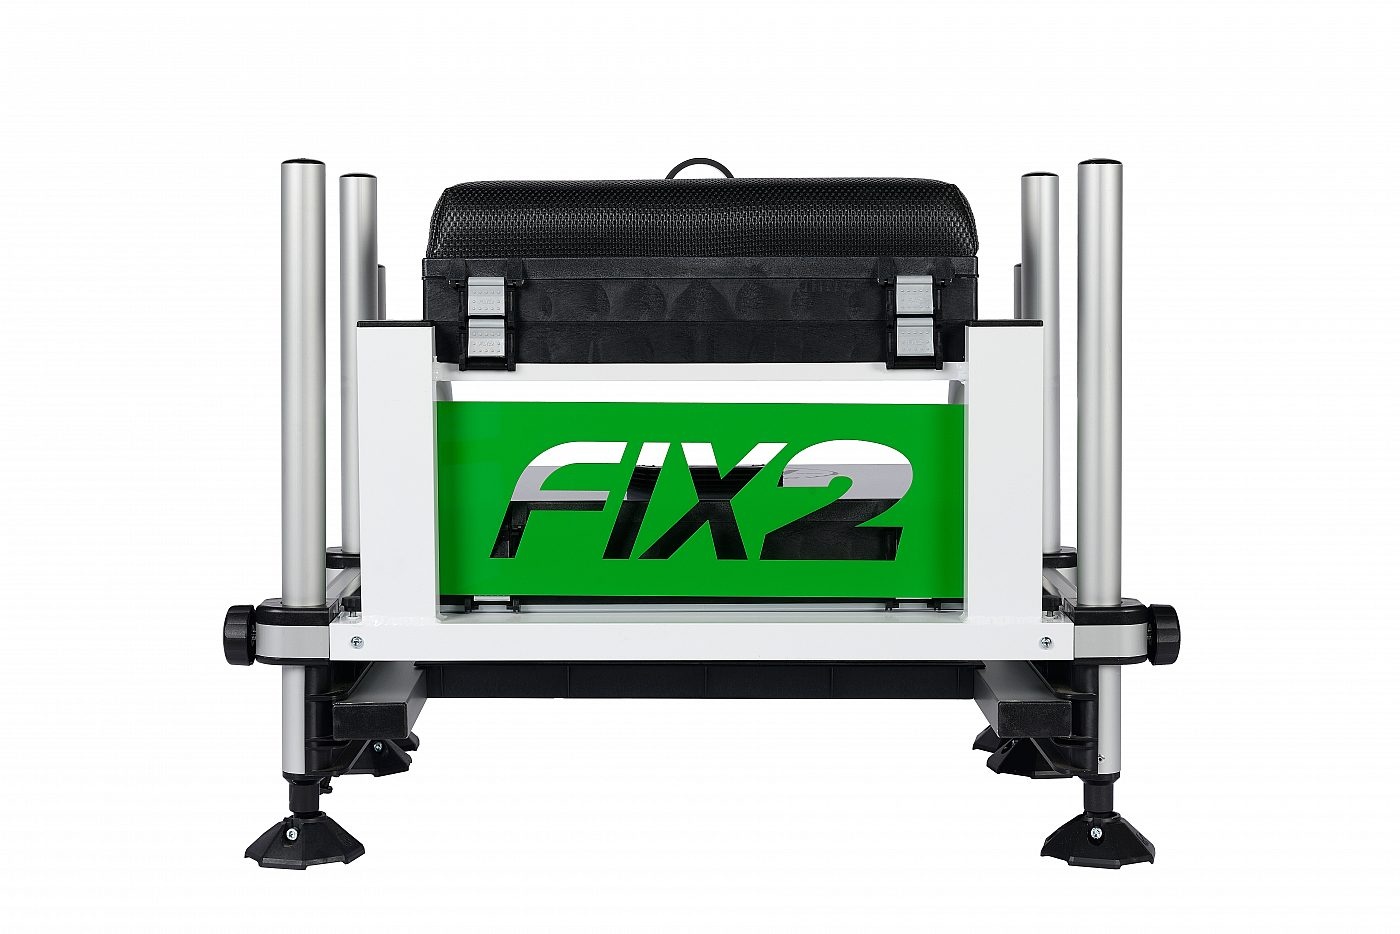 FCSX4 36 WHIGRE back